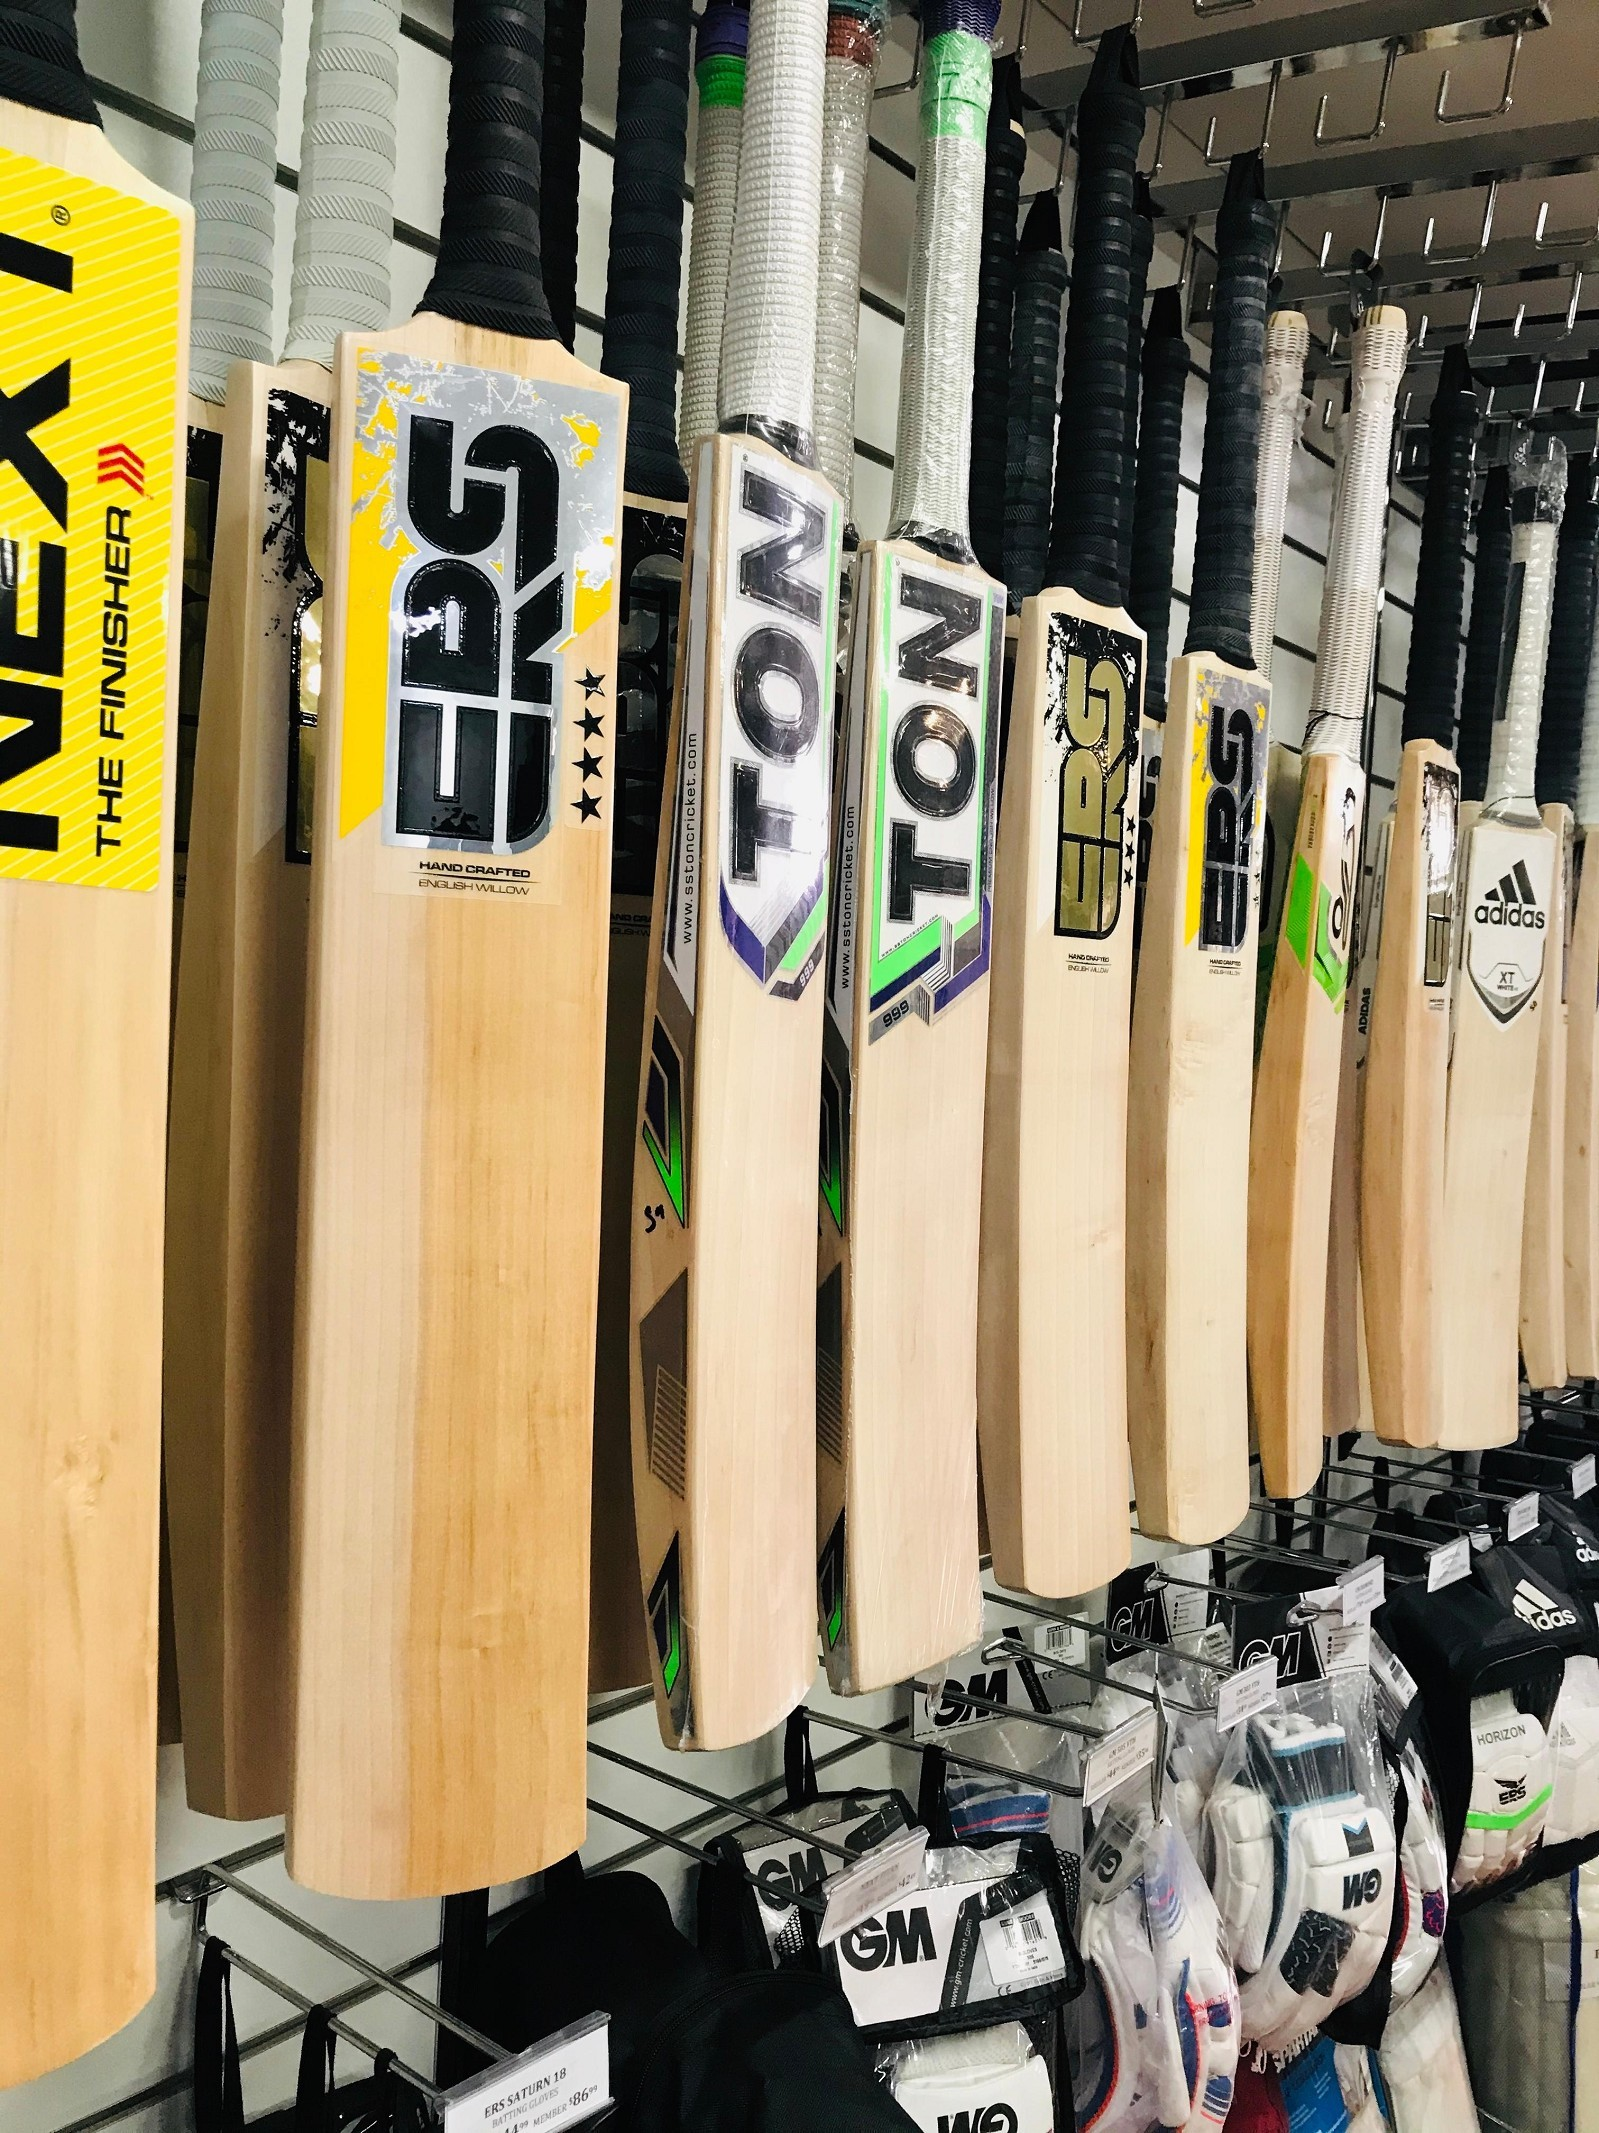 ERS Cricket Bats